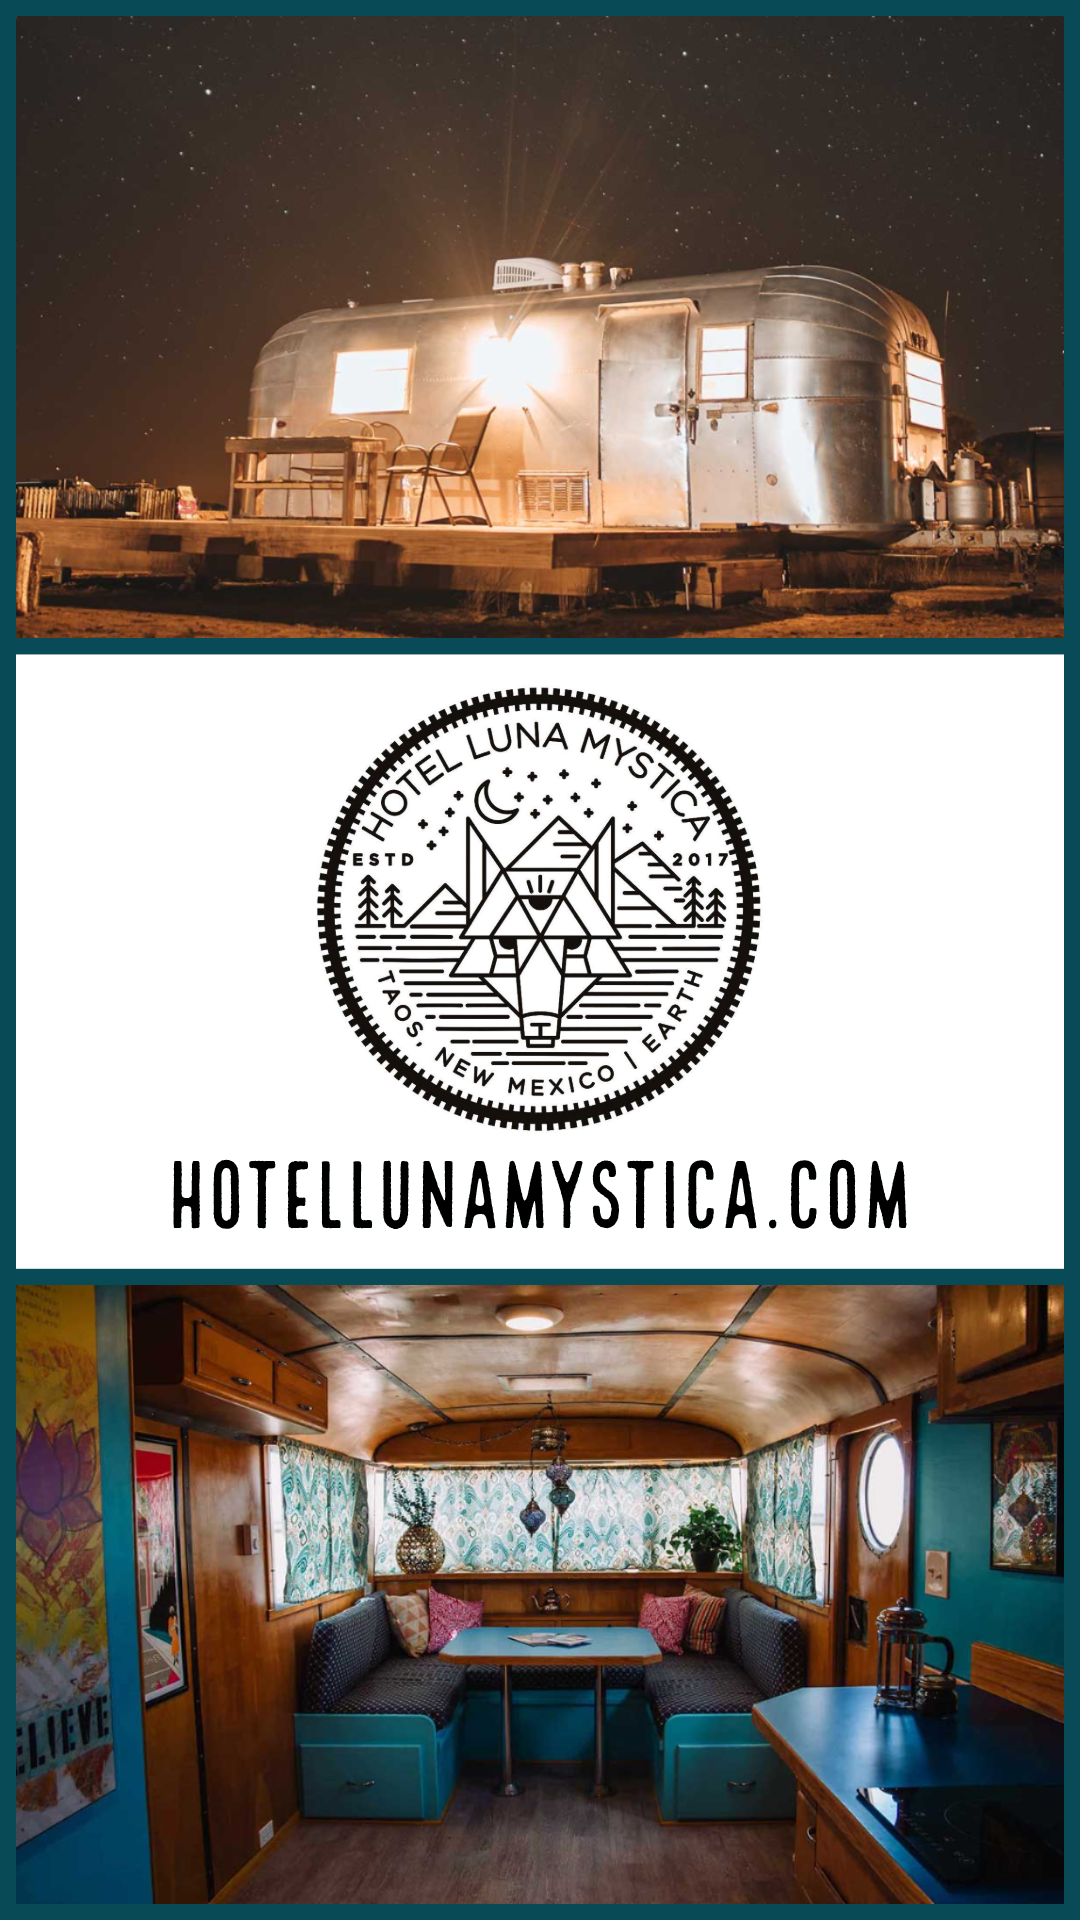 Hotel Luna Mystica Taos Mexico Hotels New Mexico